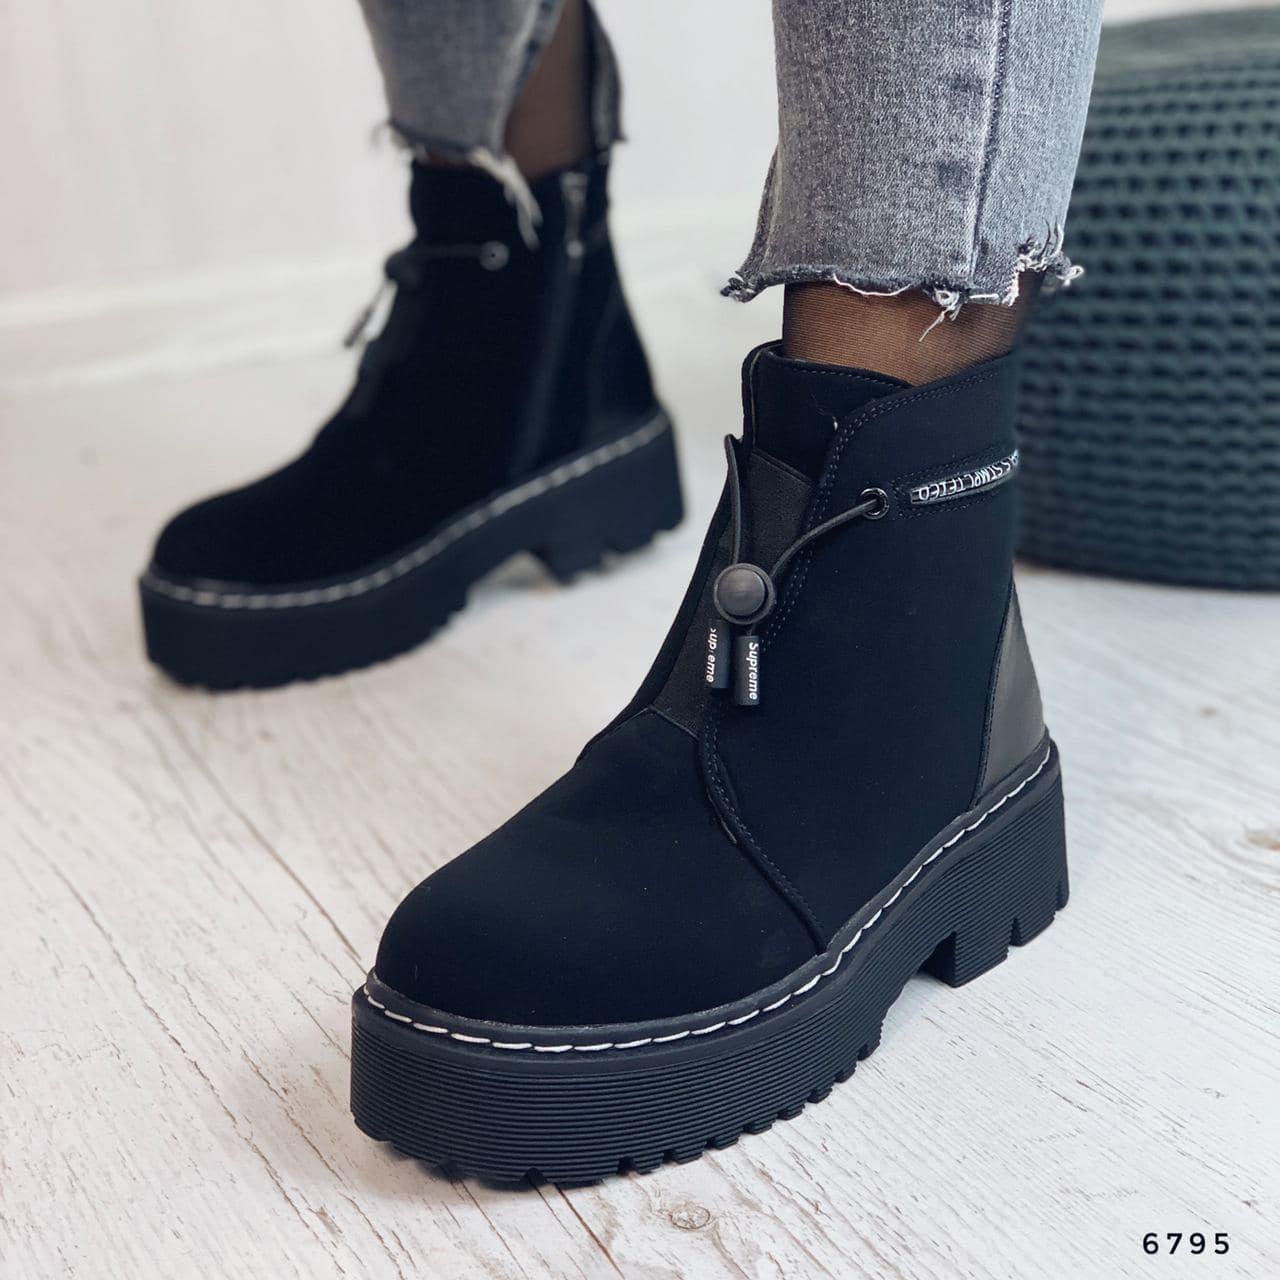 Ботинки женские черные, зимние из эко нубука. Черевики жіночі теплі чорні на платформі